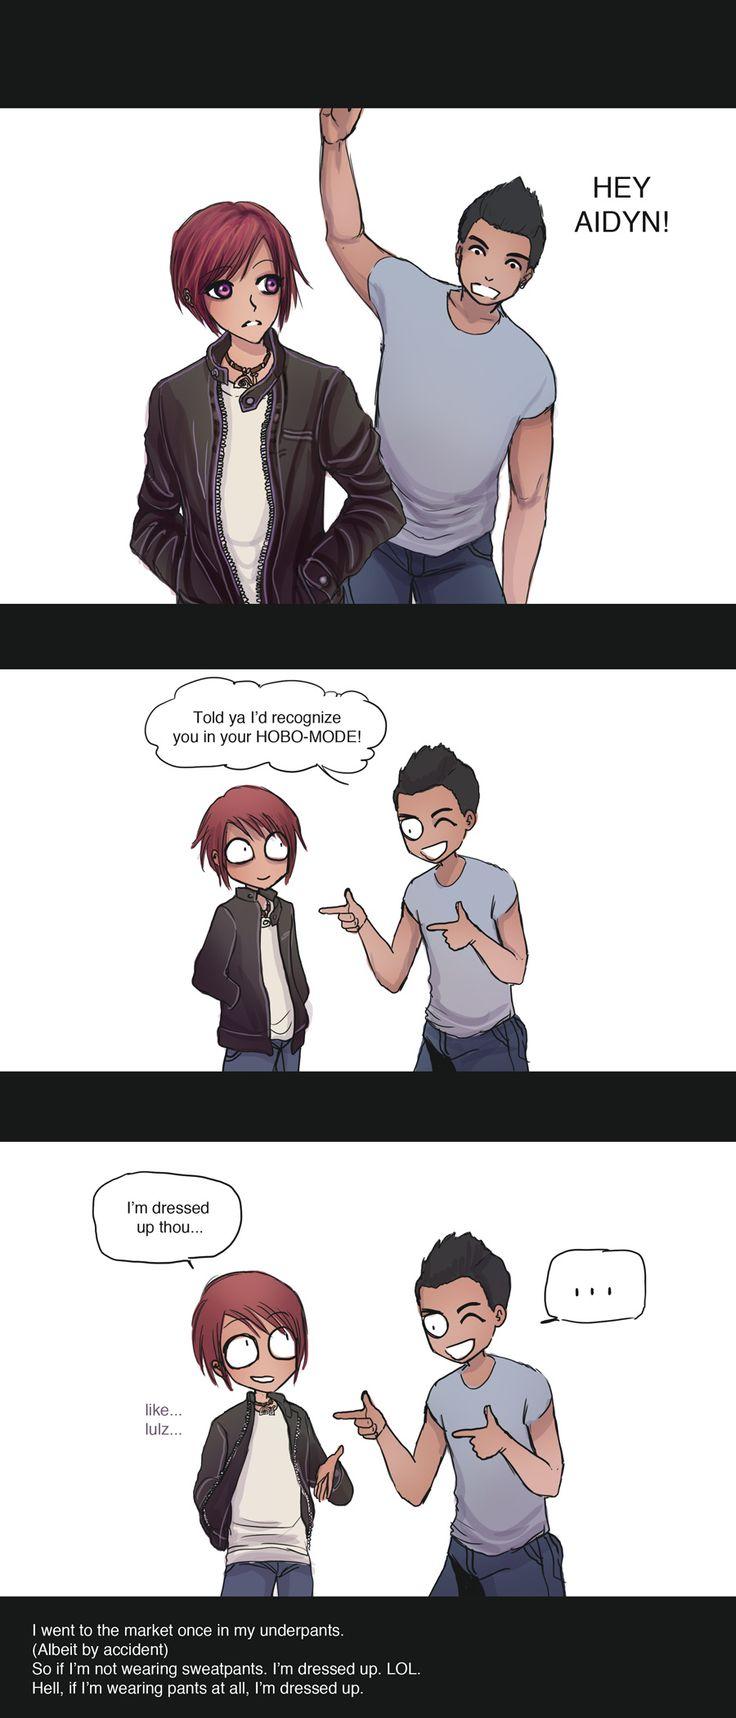 Snailed It :: Your Hobo Mode | Tapastic Comics